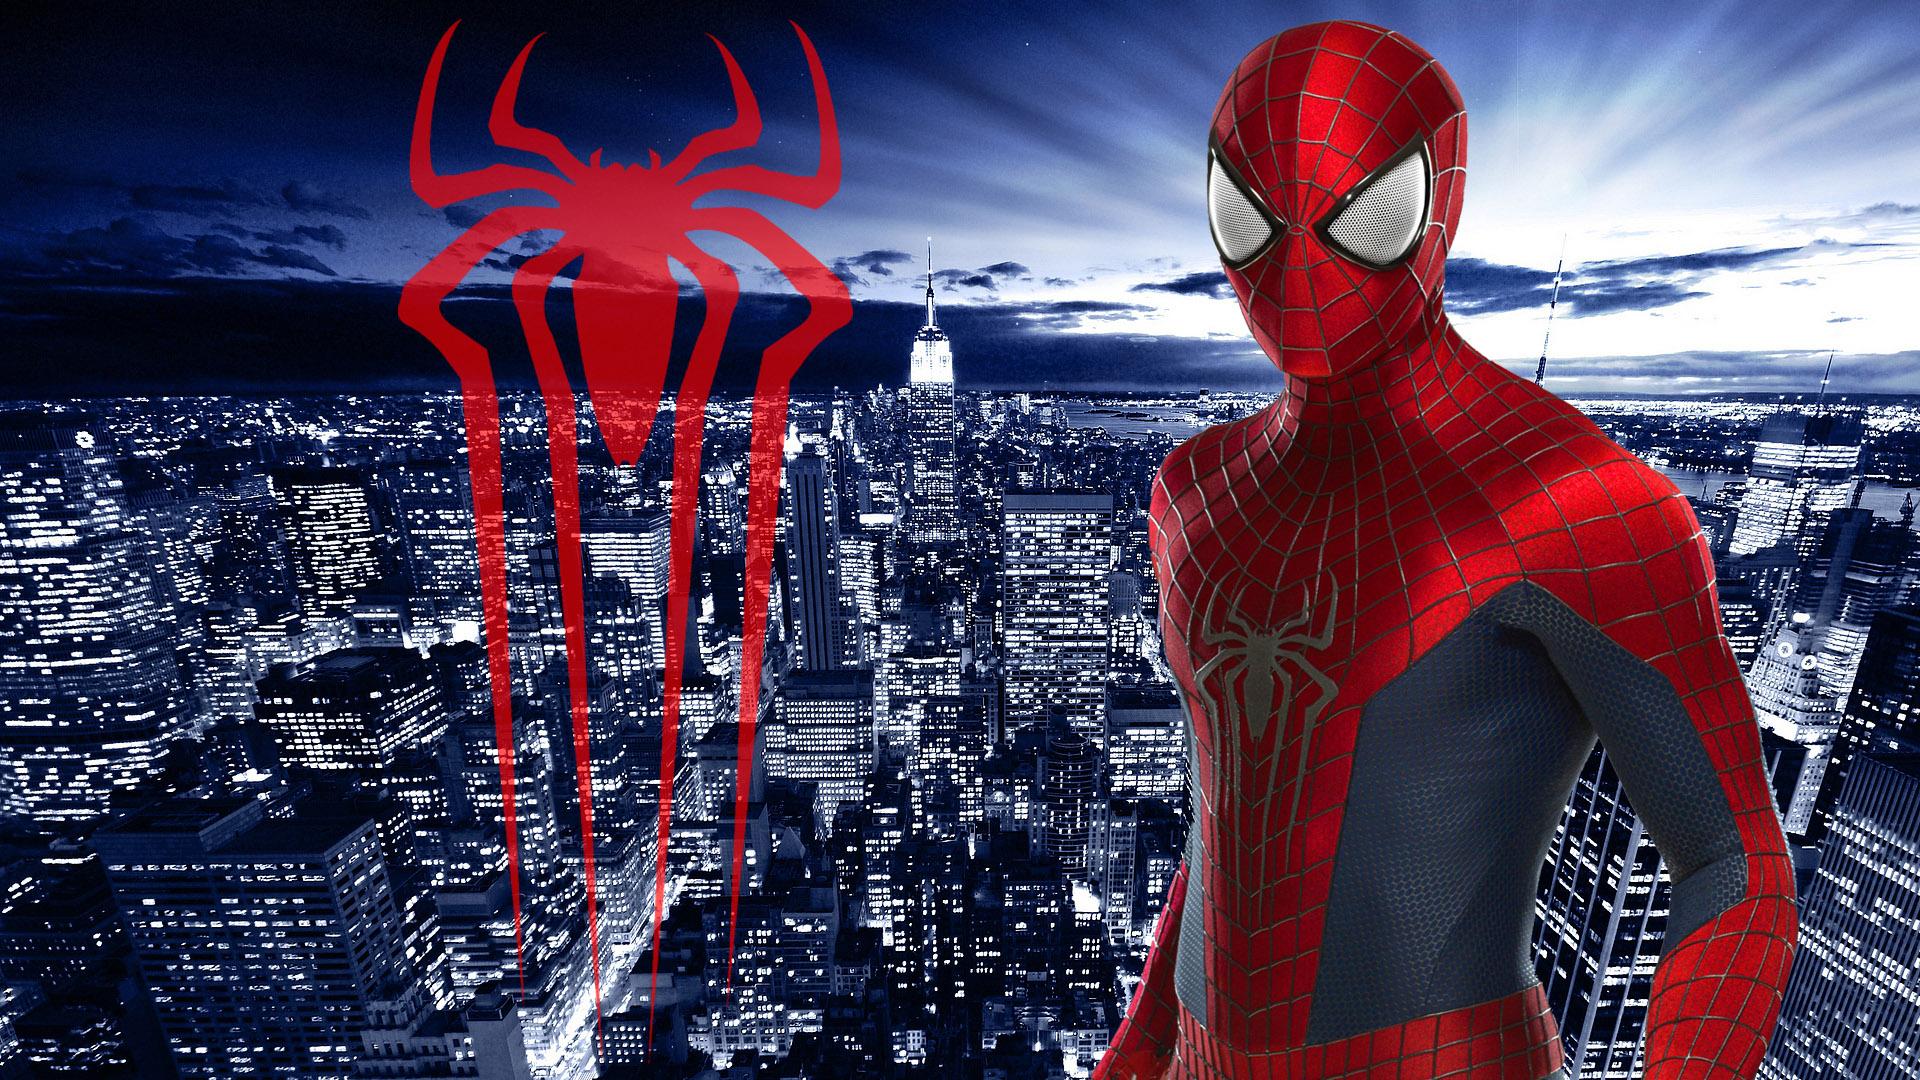 Spider-Man (from TAS2)-Wallpaper-HD-002 by Super-TyBone82 ...